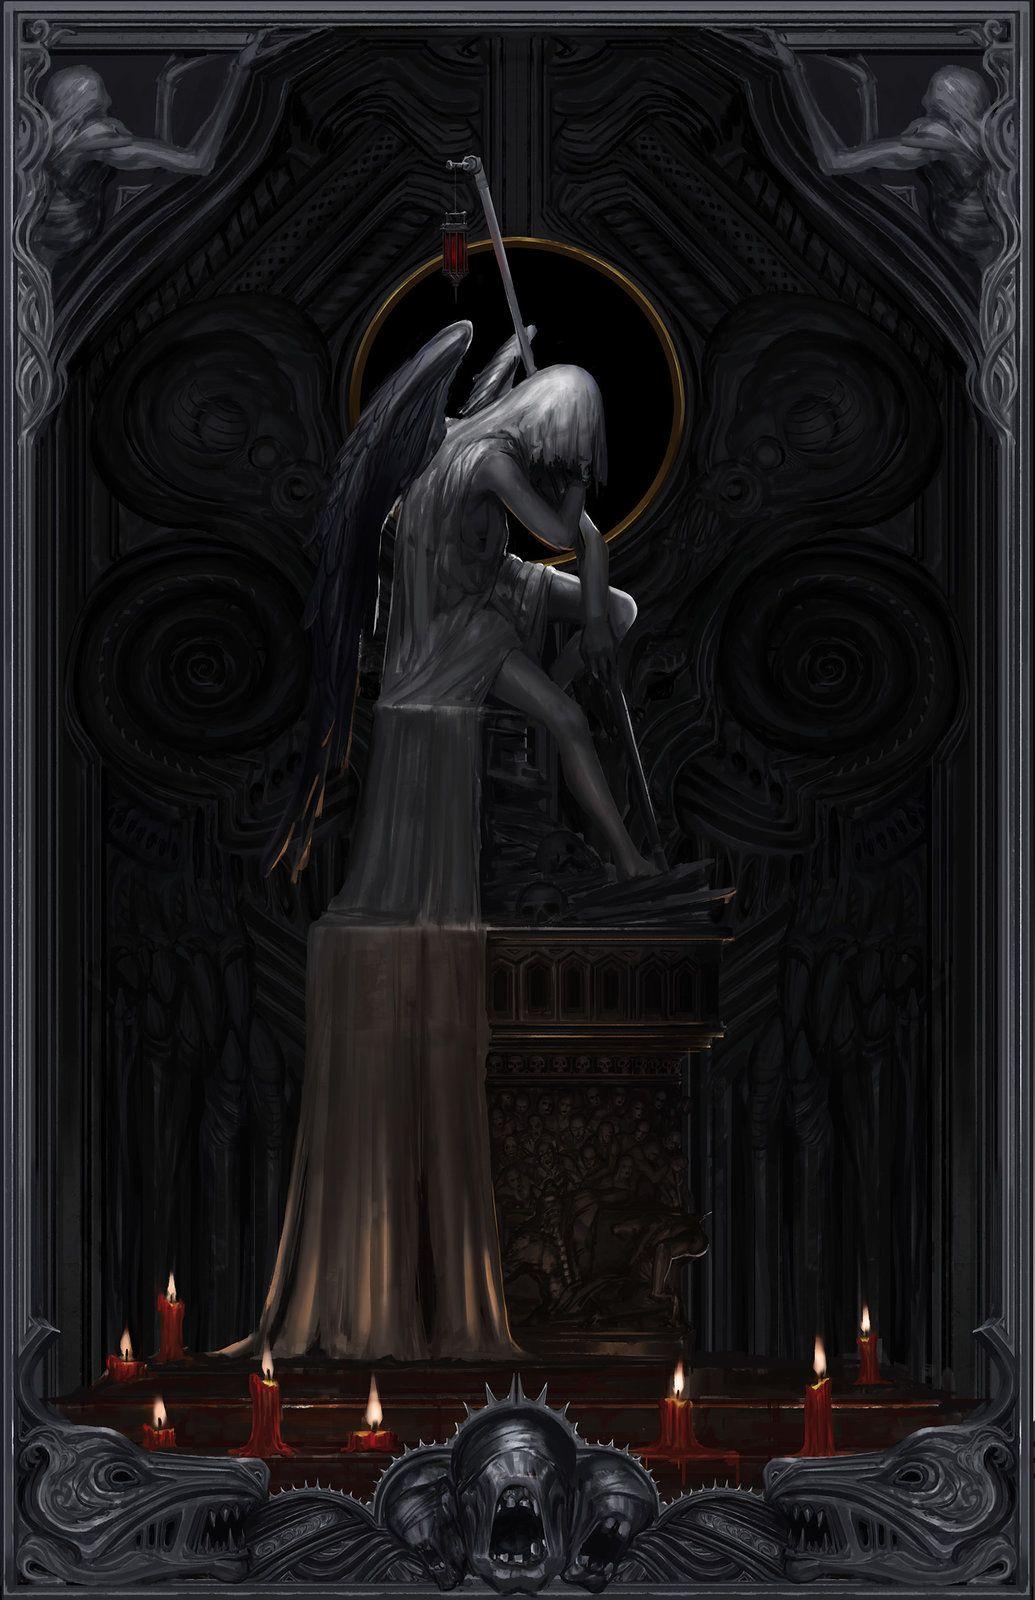 Born in Blood, Fei F. Ou on ArtStation at https://www.artstation.com/artwork/wJrl9